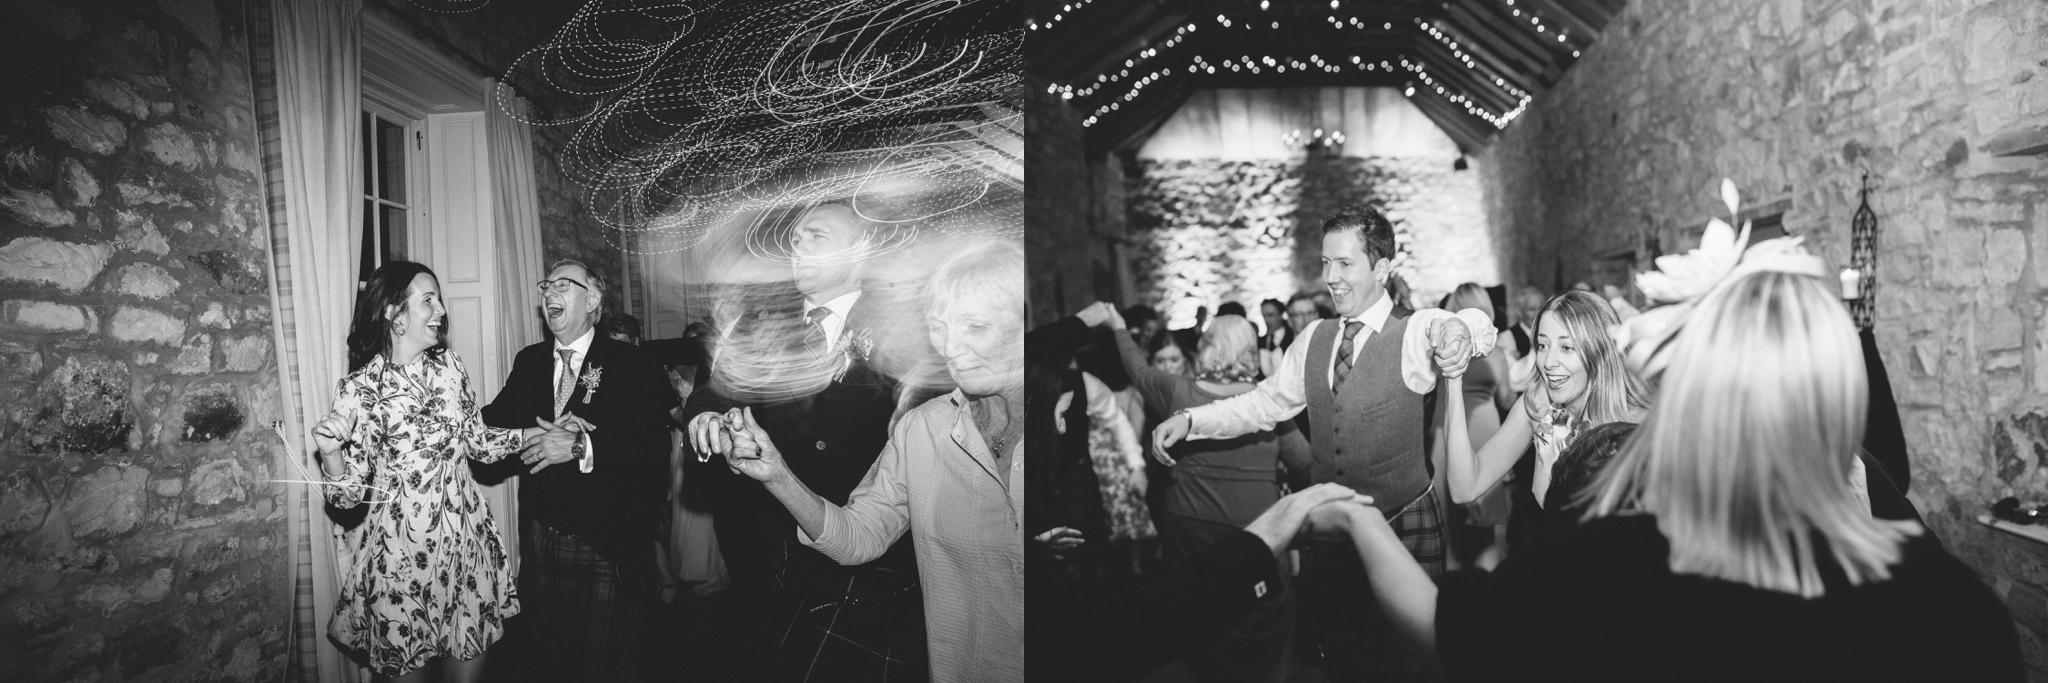 Suzanne_li_photography_kirknewton_wedding_0073.jpg